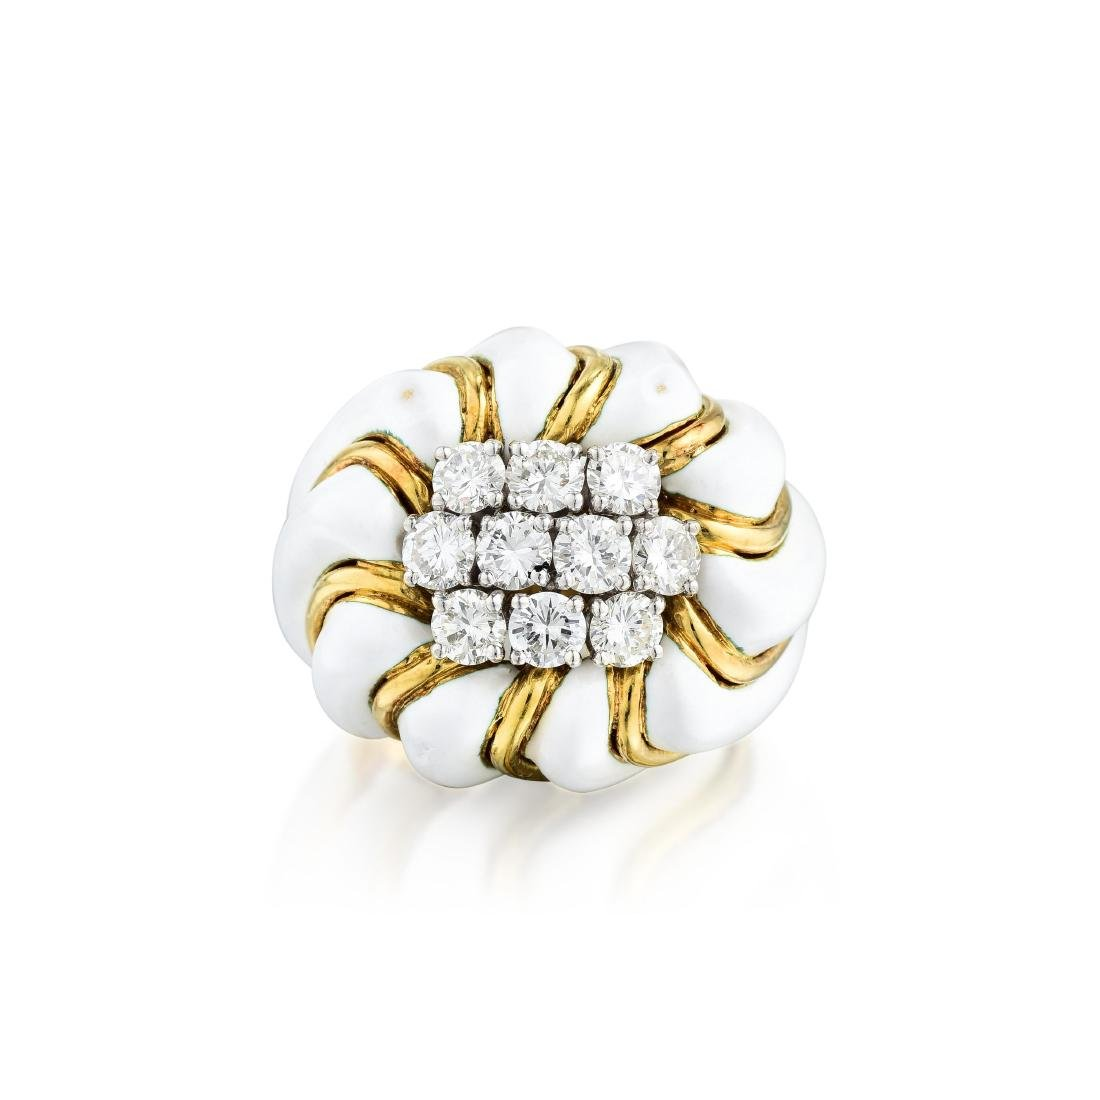 David Webb Diamond and Enamel Ring